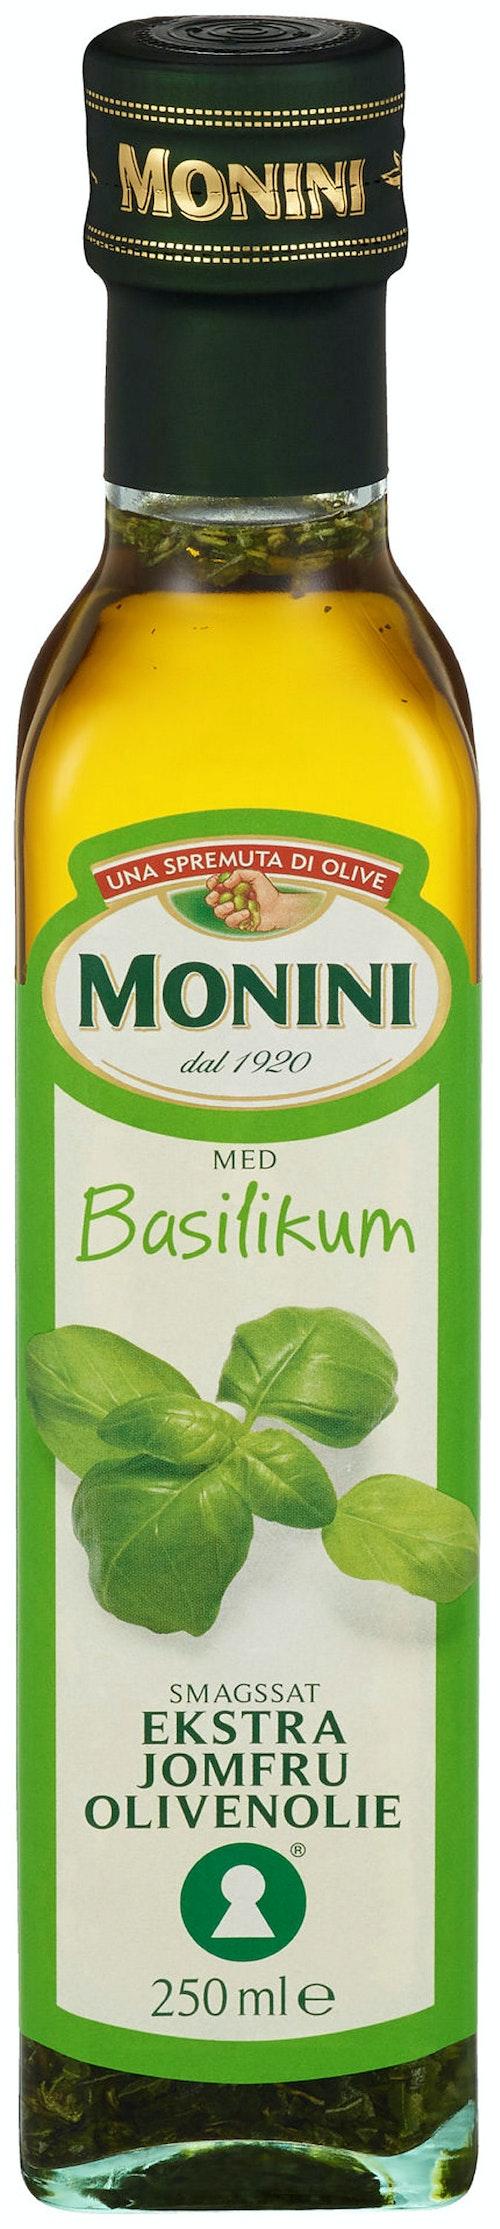 Monini Olivenolje Basilikum, 250 ml